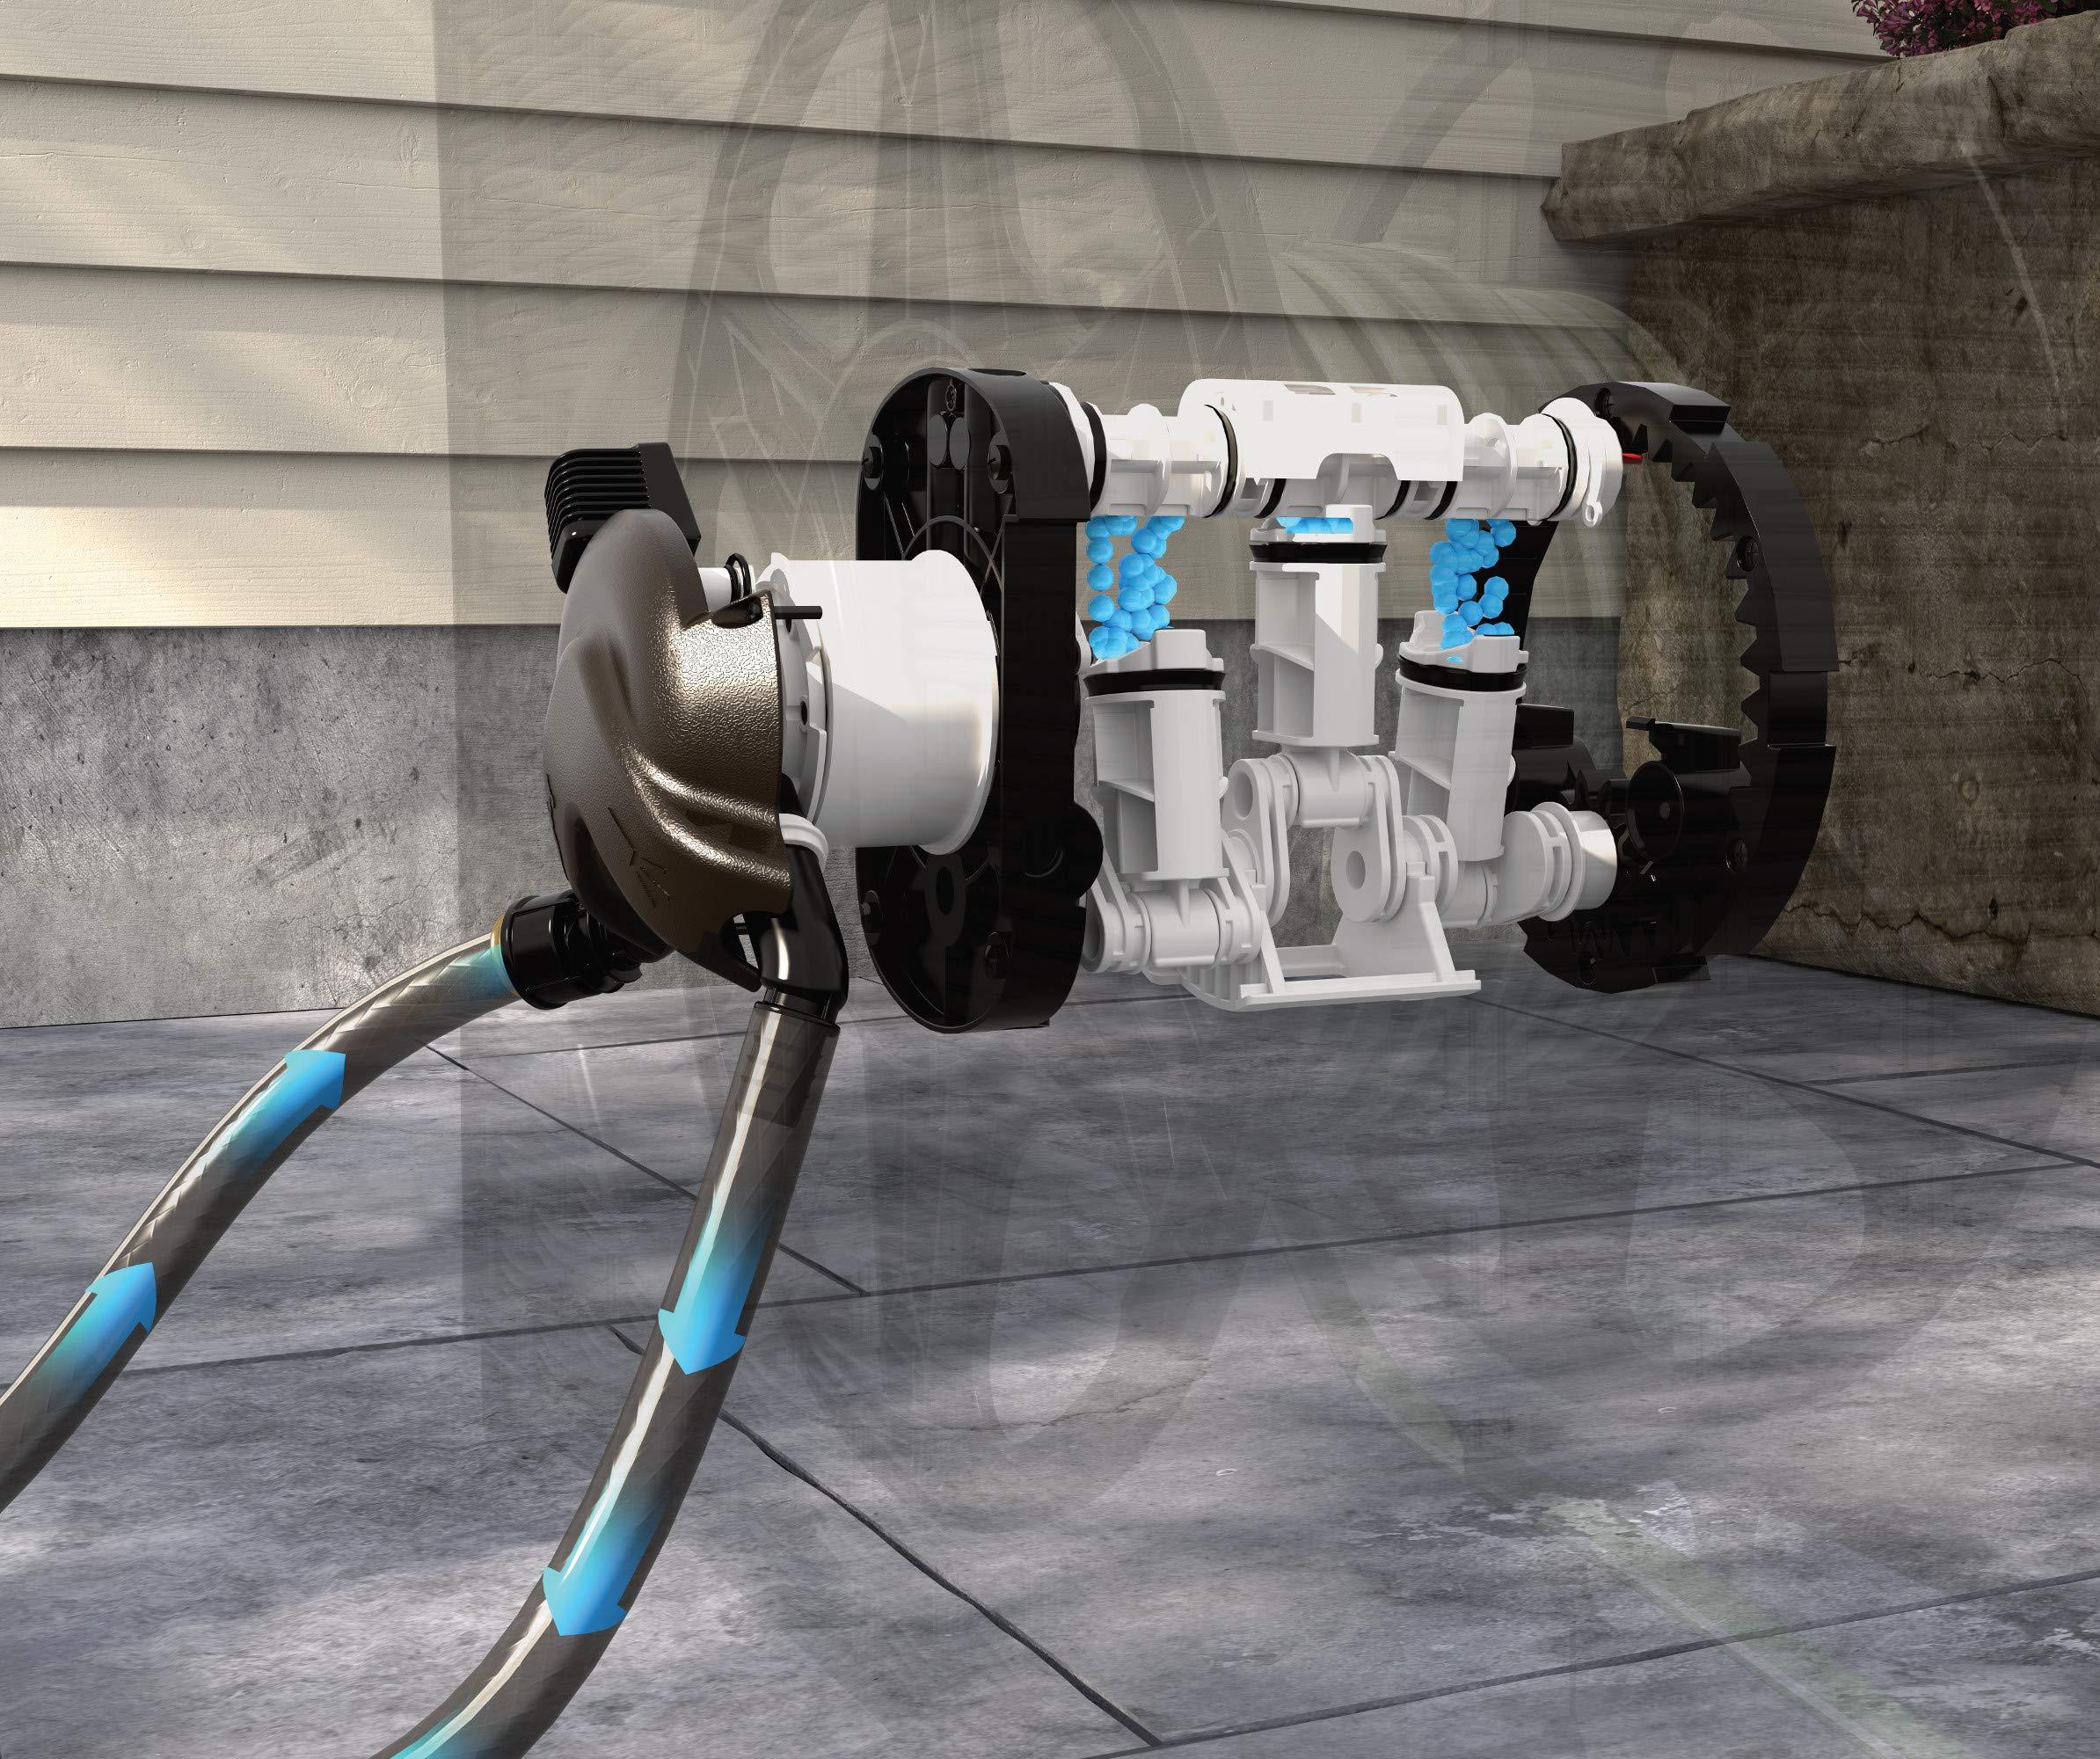 Suncast Aquawinder 125' Wicker Garden Hose Reel - Lightweight Portable Hands - Free Water Powered Retractable Hose Reel - Java by Suncast